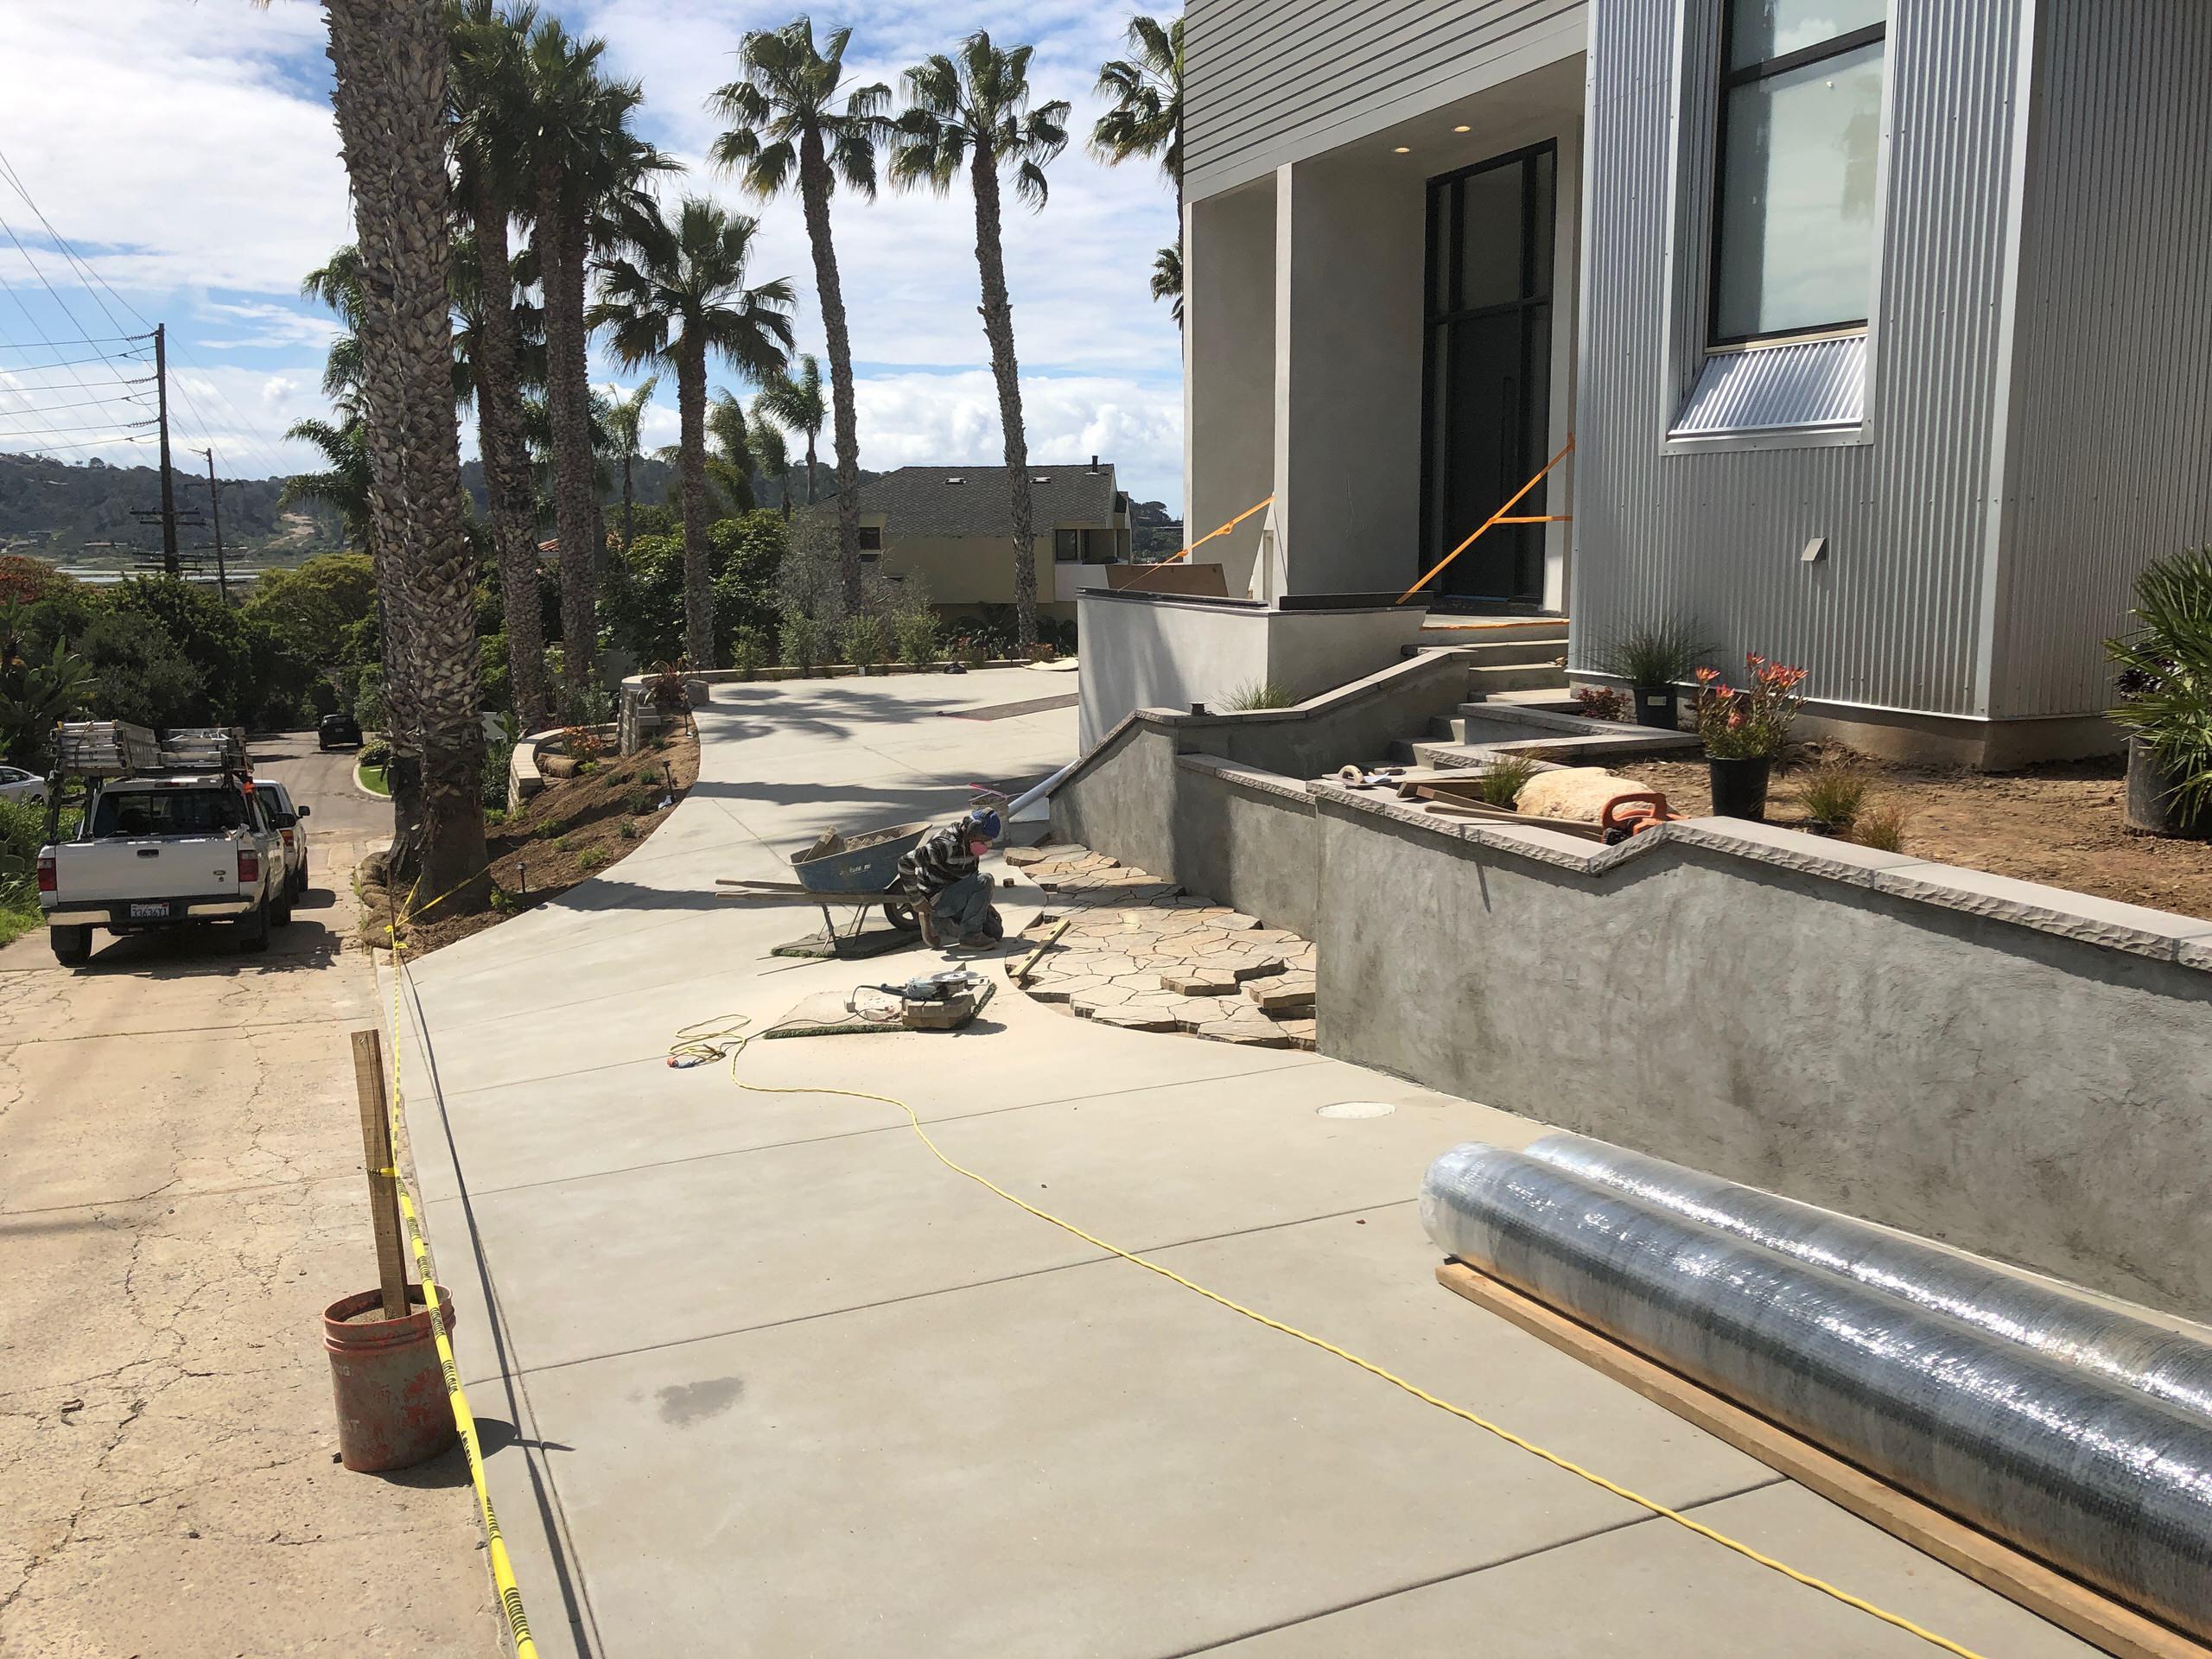 Installing Belgard Pavers in the Driveway